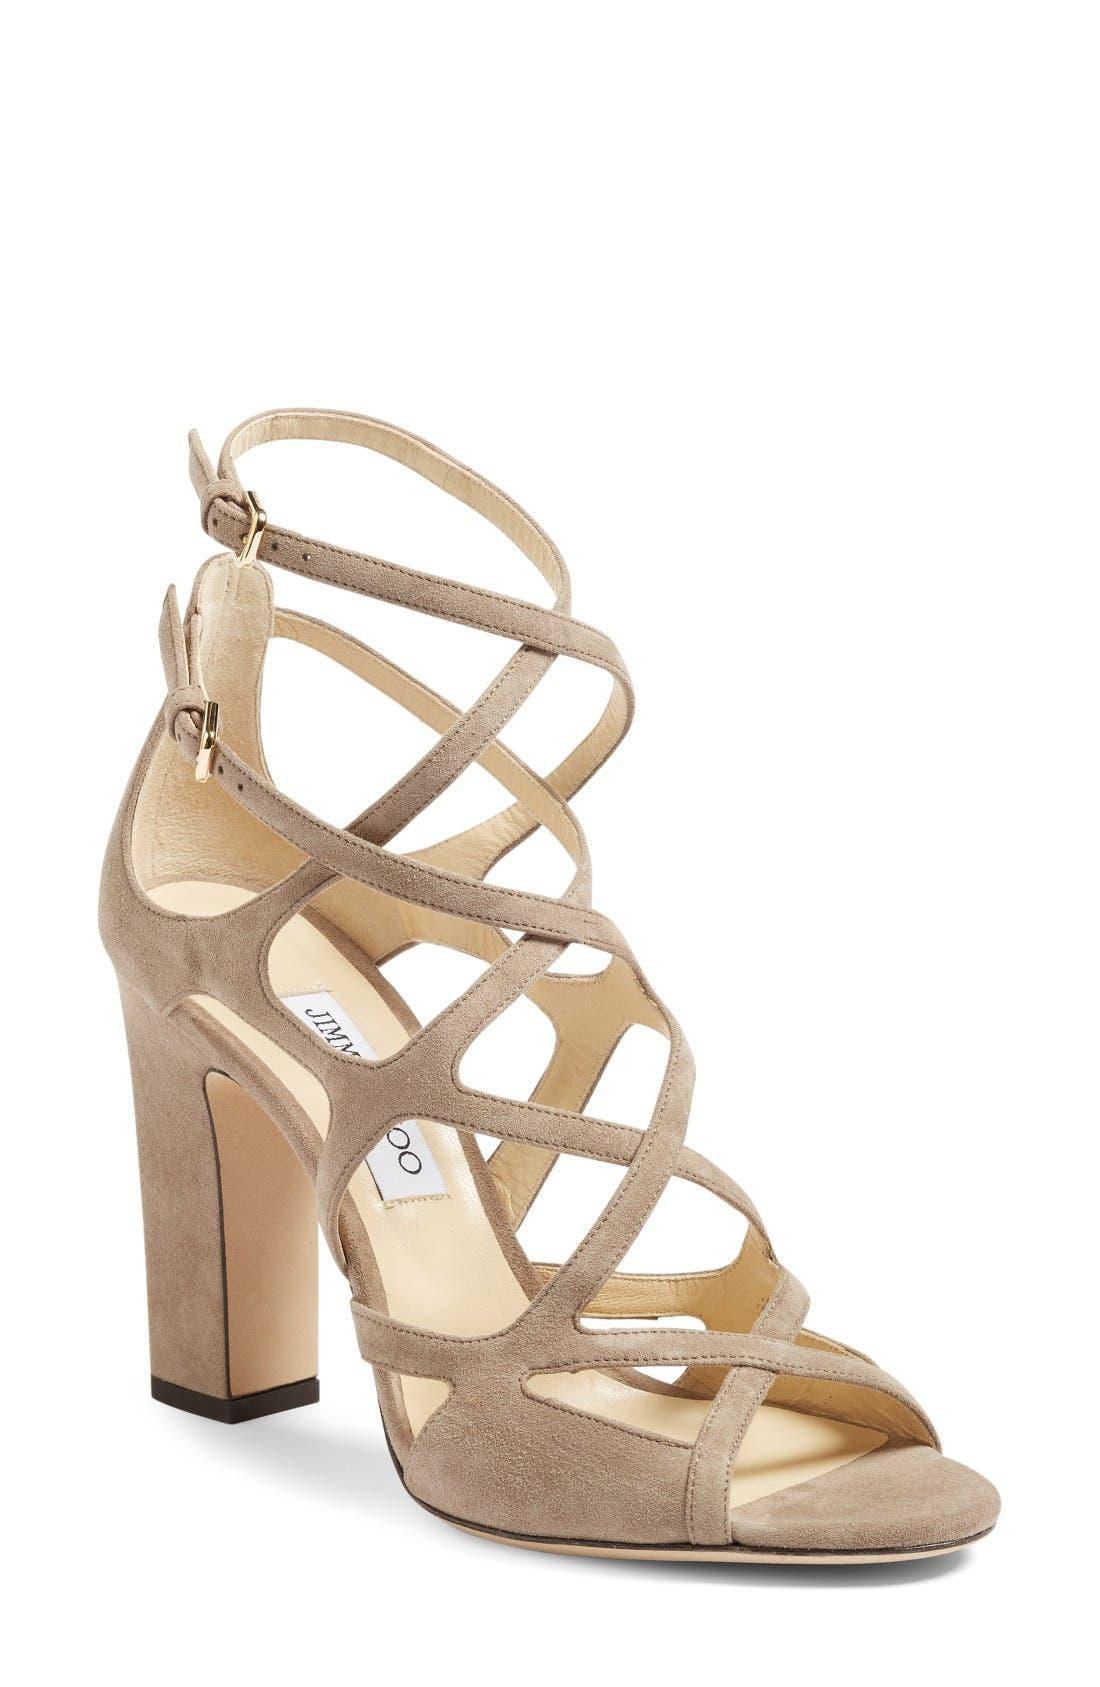 JIMMY CHOO Dillan Block Heel Sandal